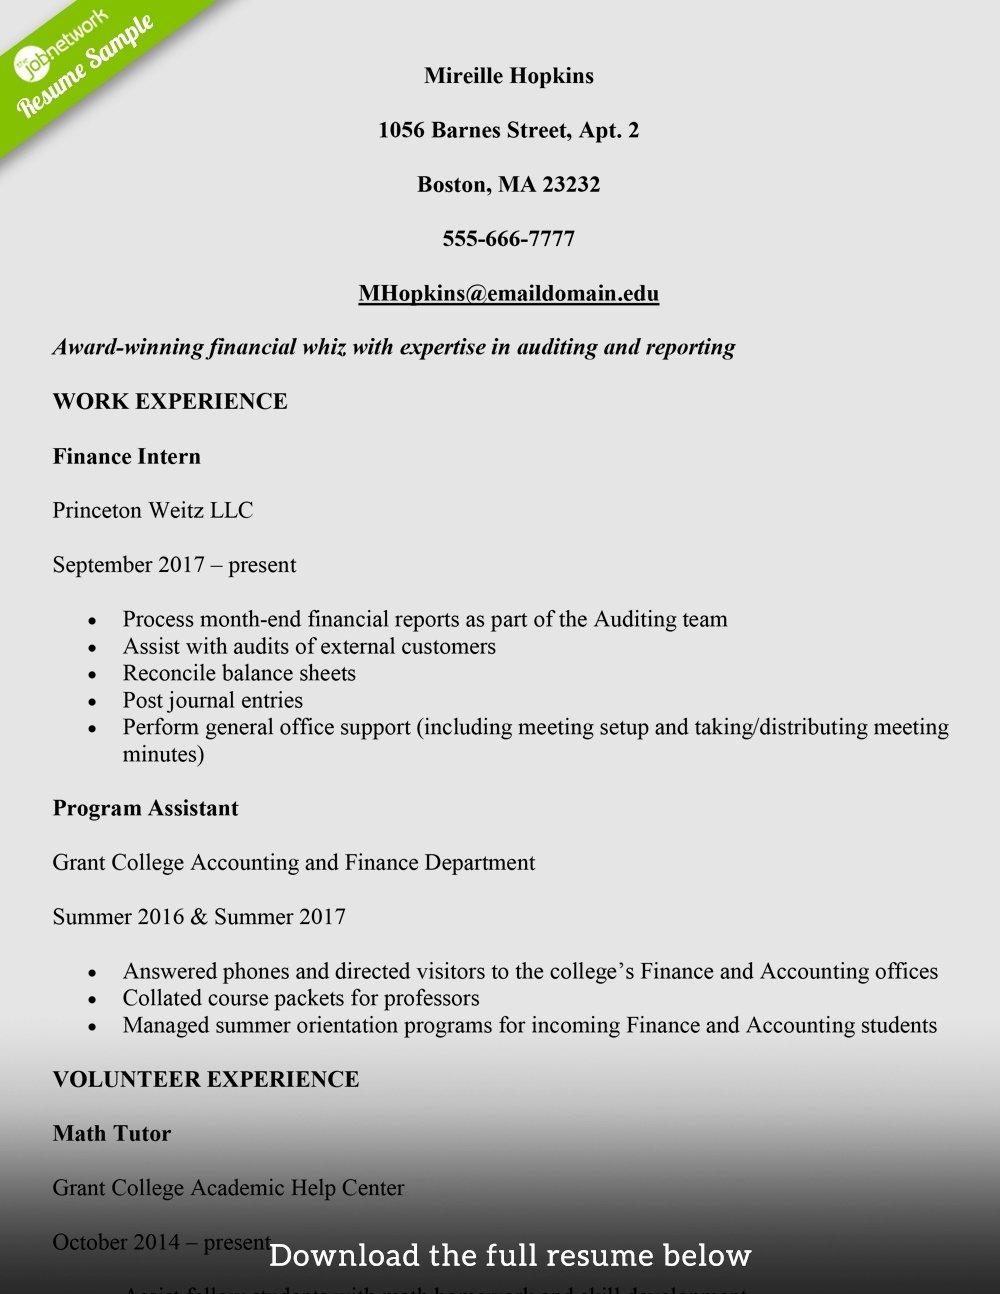 Resume Samples for College Student Fresh Job Resumes for College Students